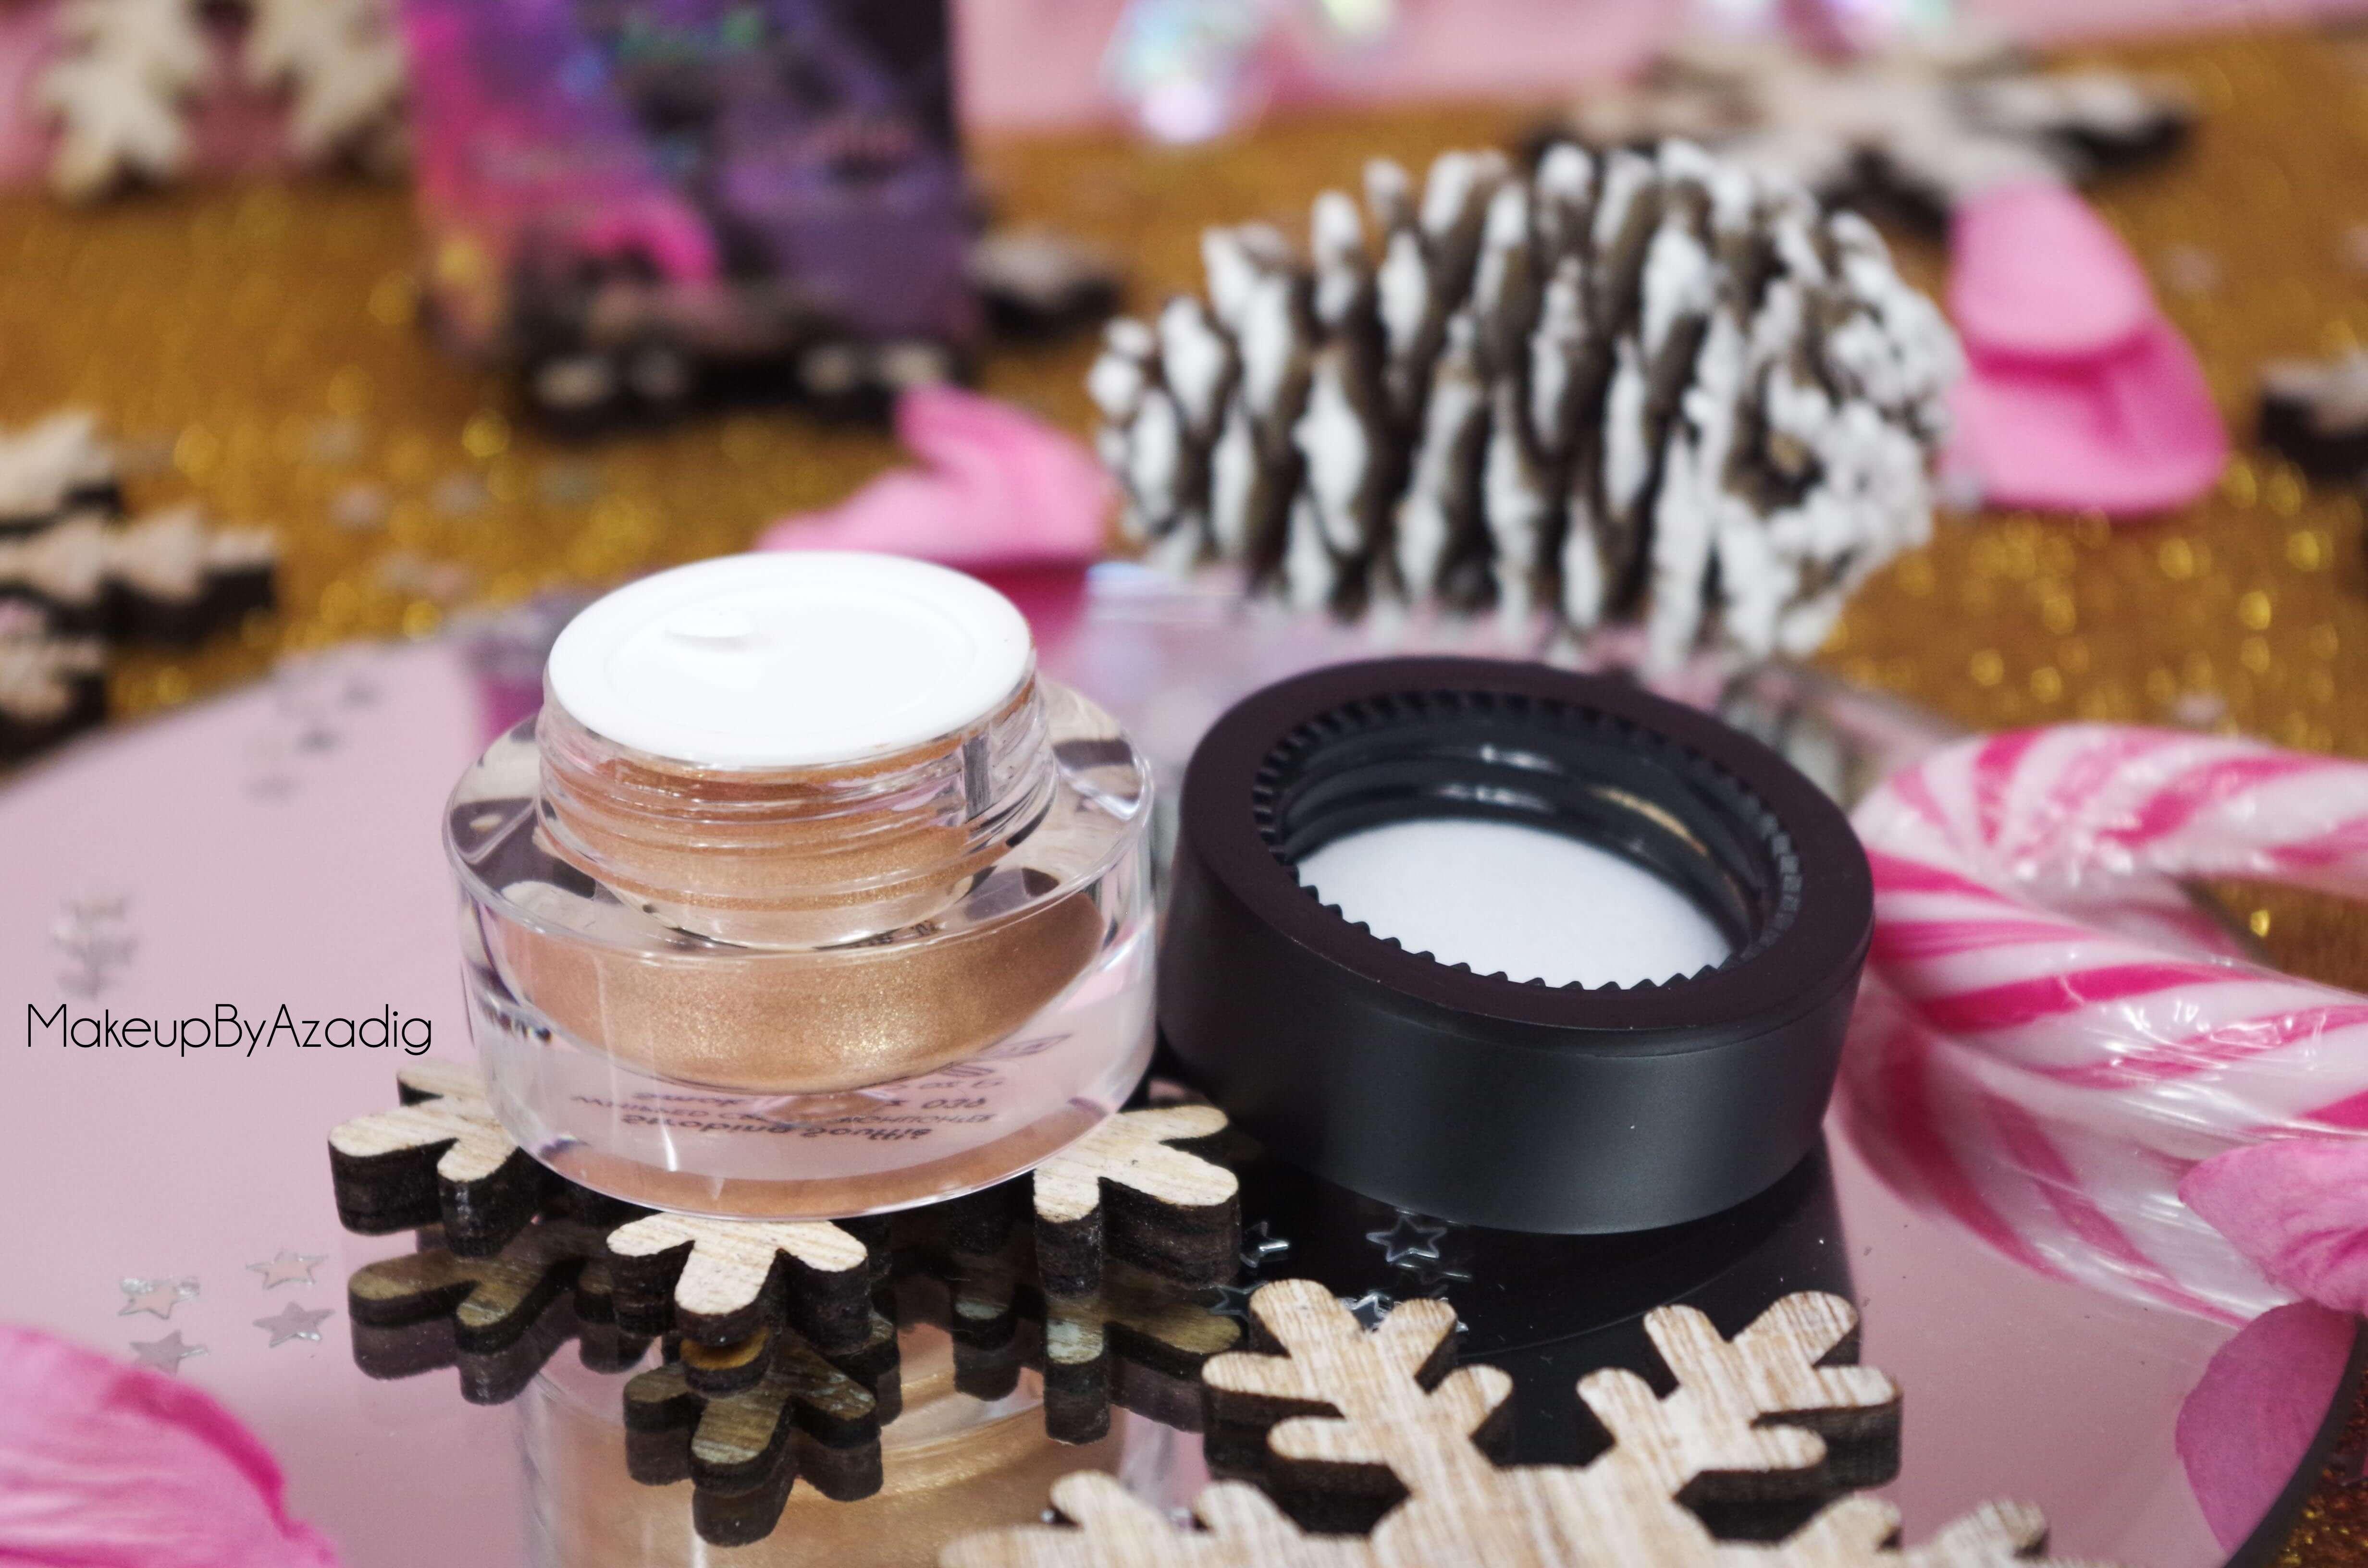 highlighter-sleek-makeup-strobing-souffle-smoky-quartz-sephora-swatch-makeupbyazadig-avis-pot